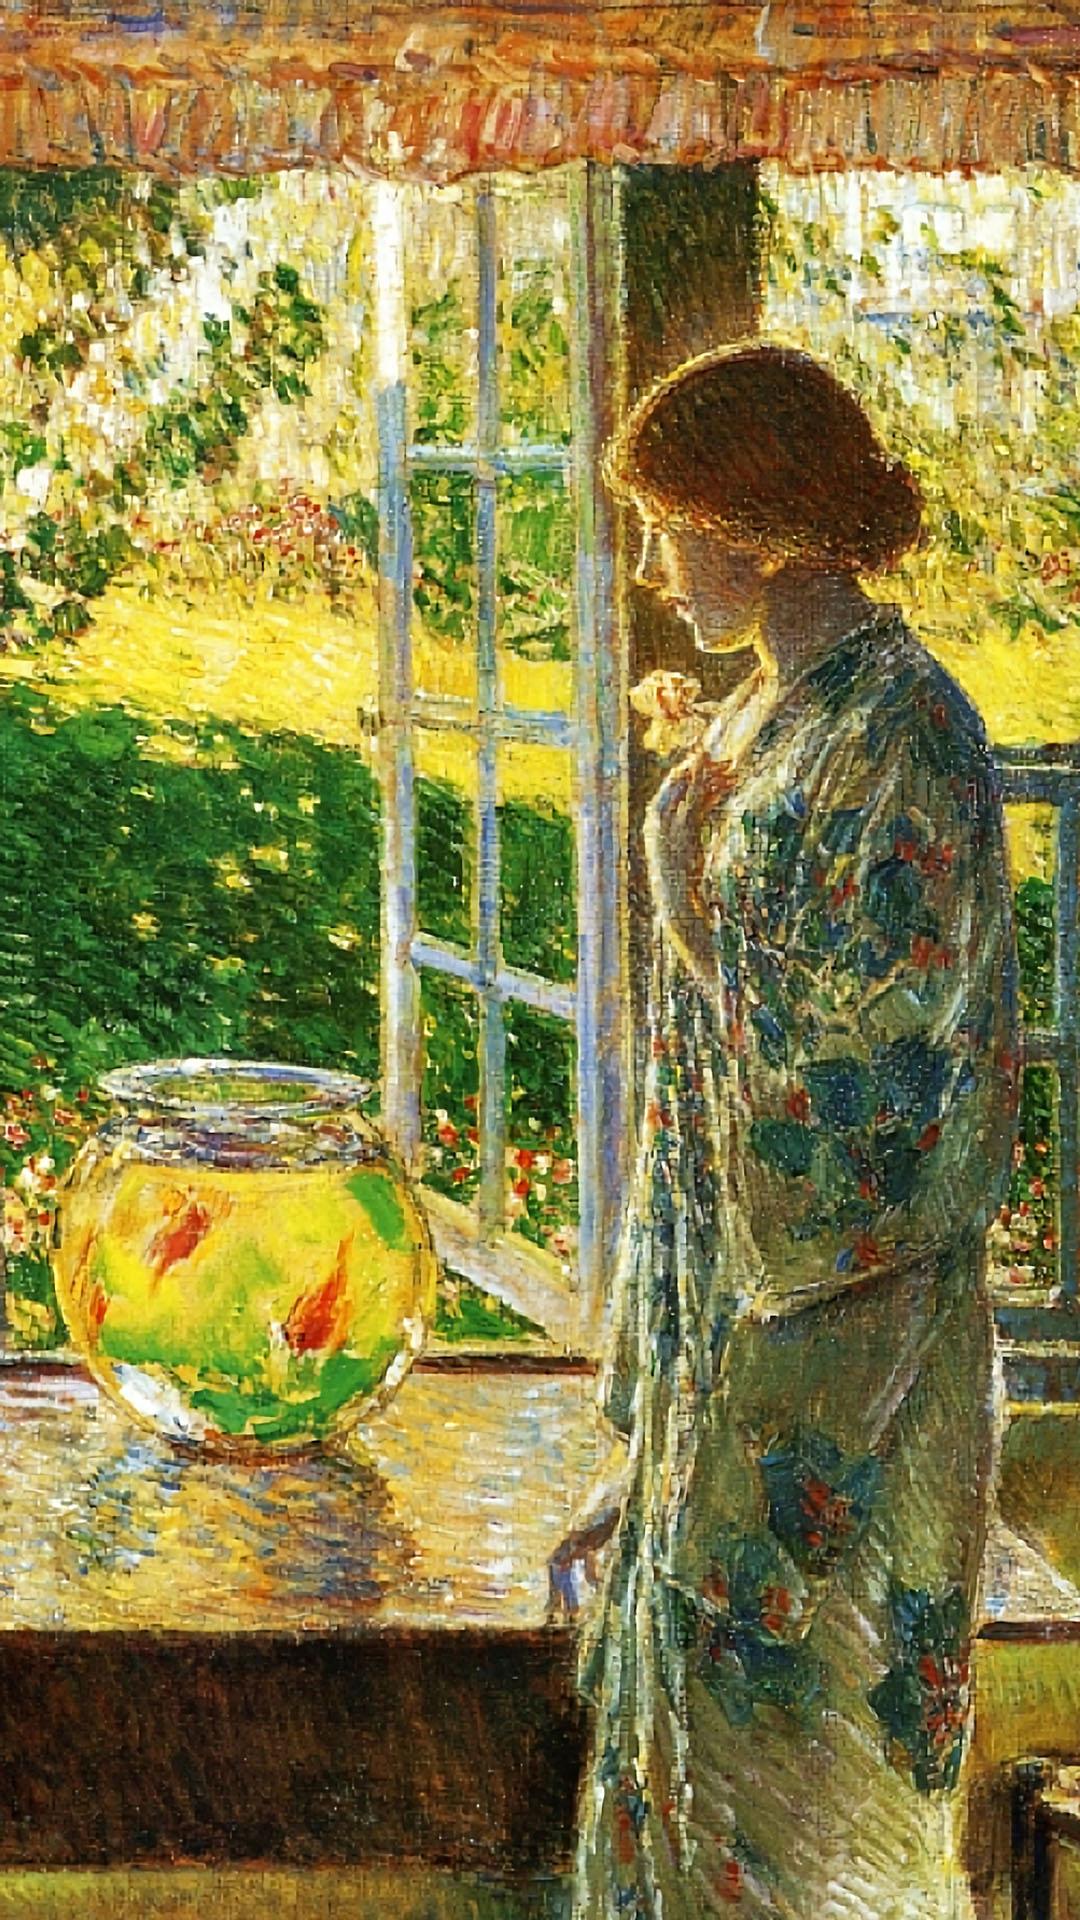 Frederick Childe Hassam - The Goldfish Window 1080x1920